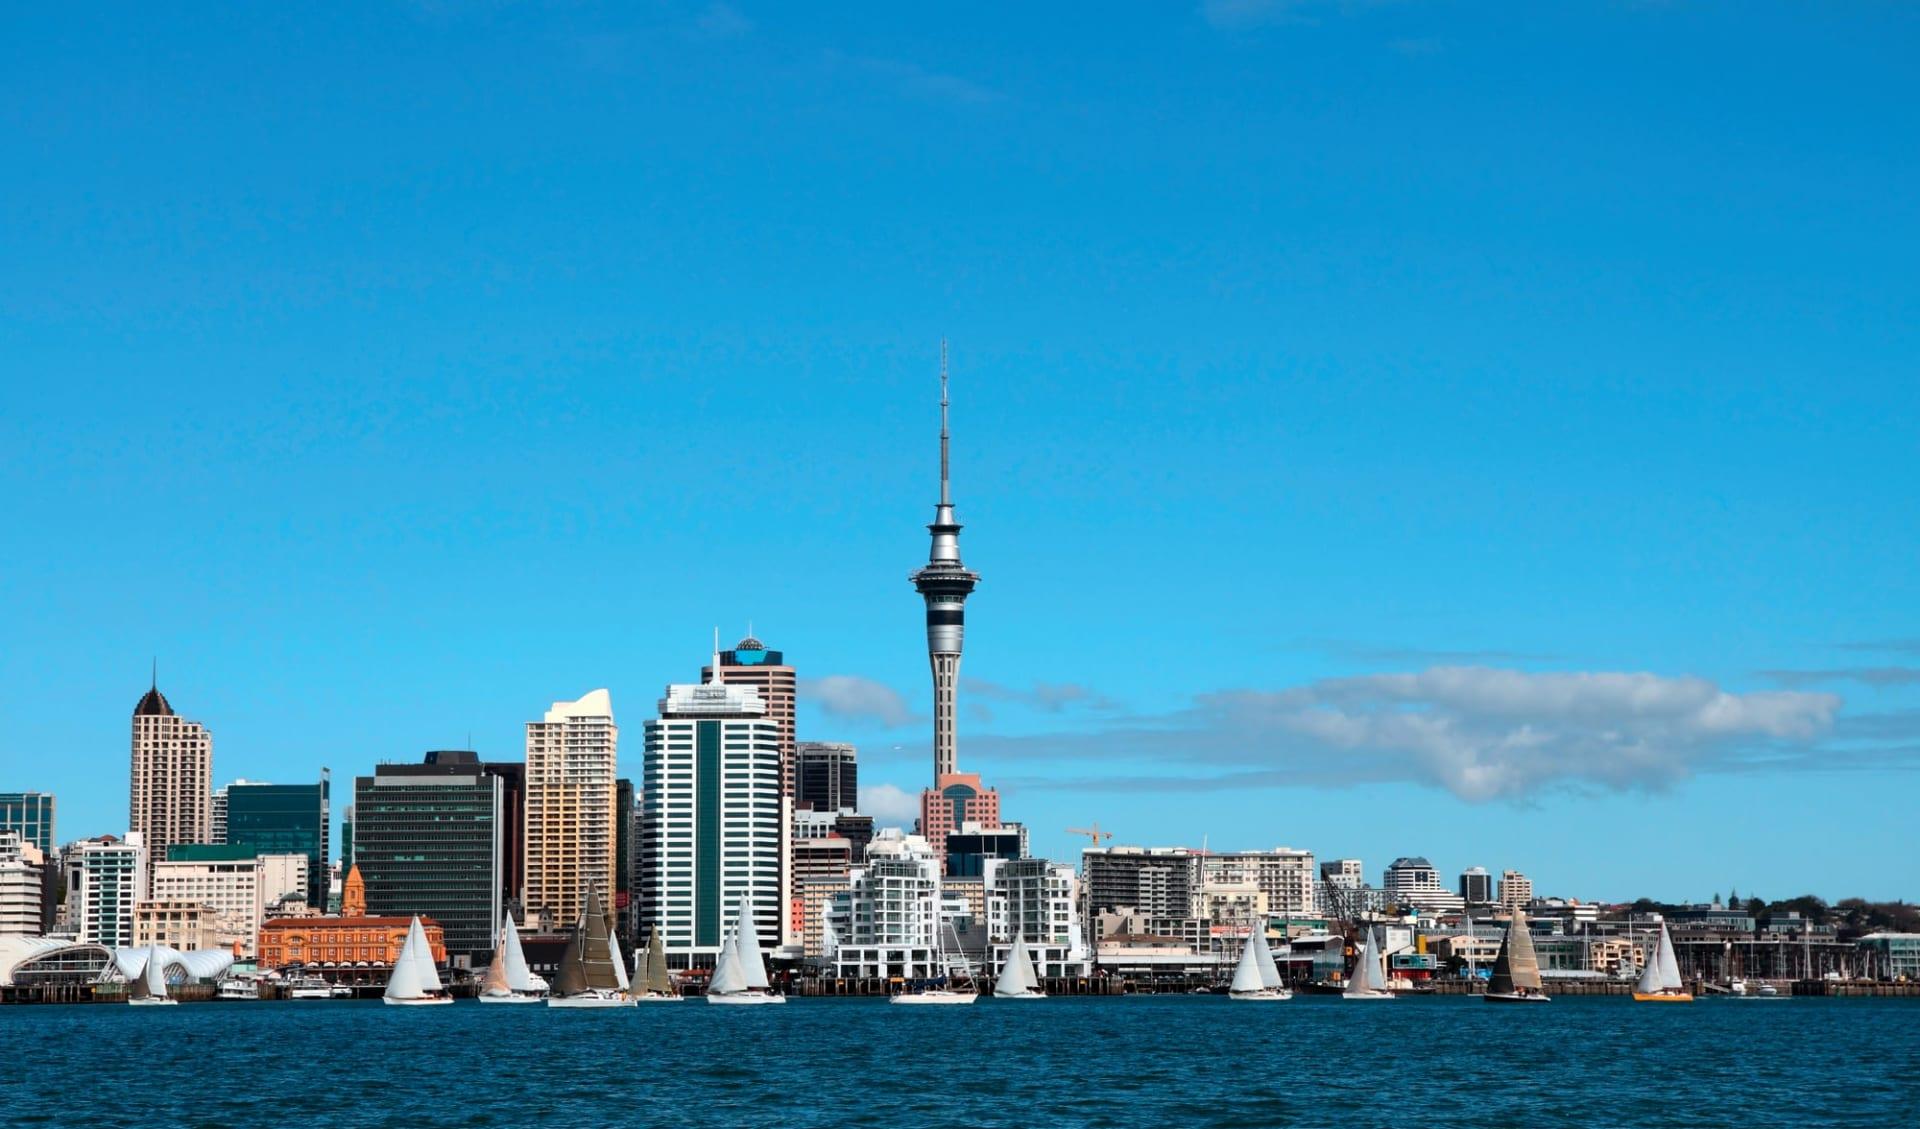 Zauber der Nordinsel ab Auckland: Neuseeland - Auckland - Auckland Skyline